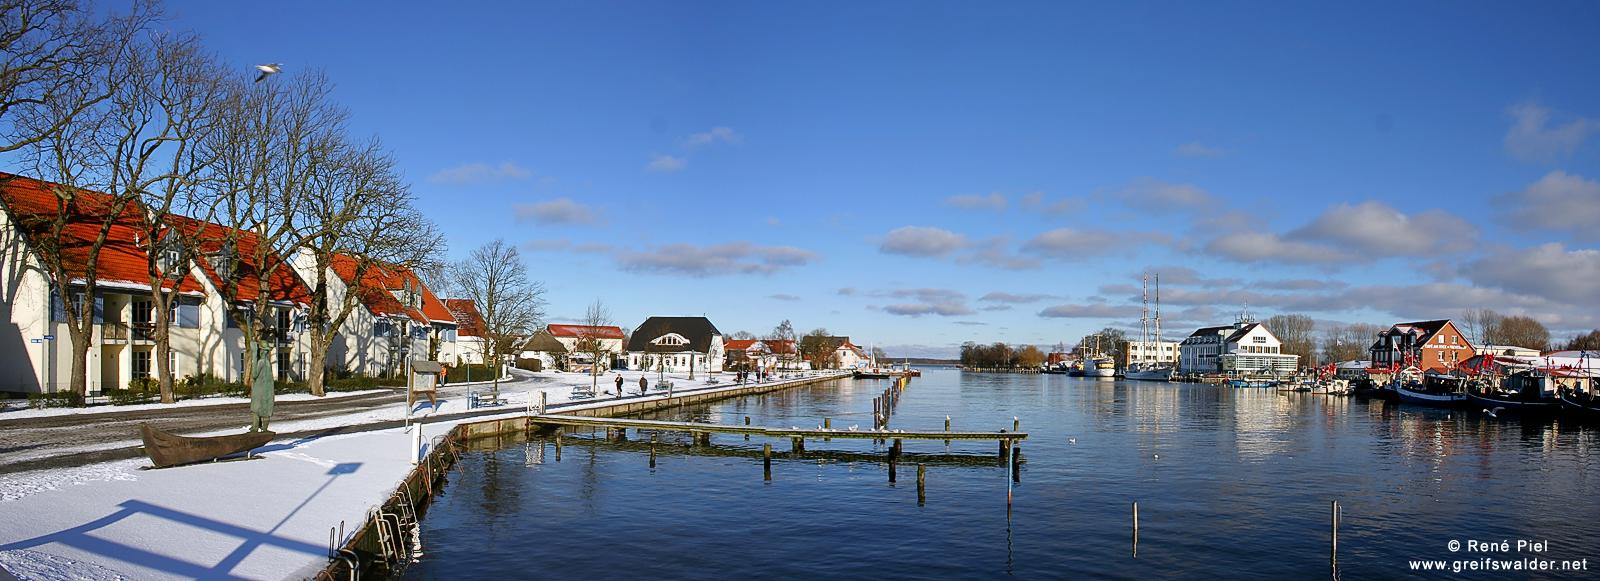 Panorama Greifswald-Wieck